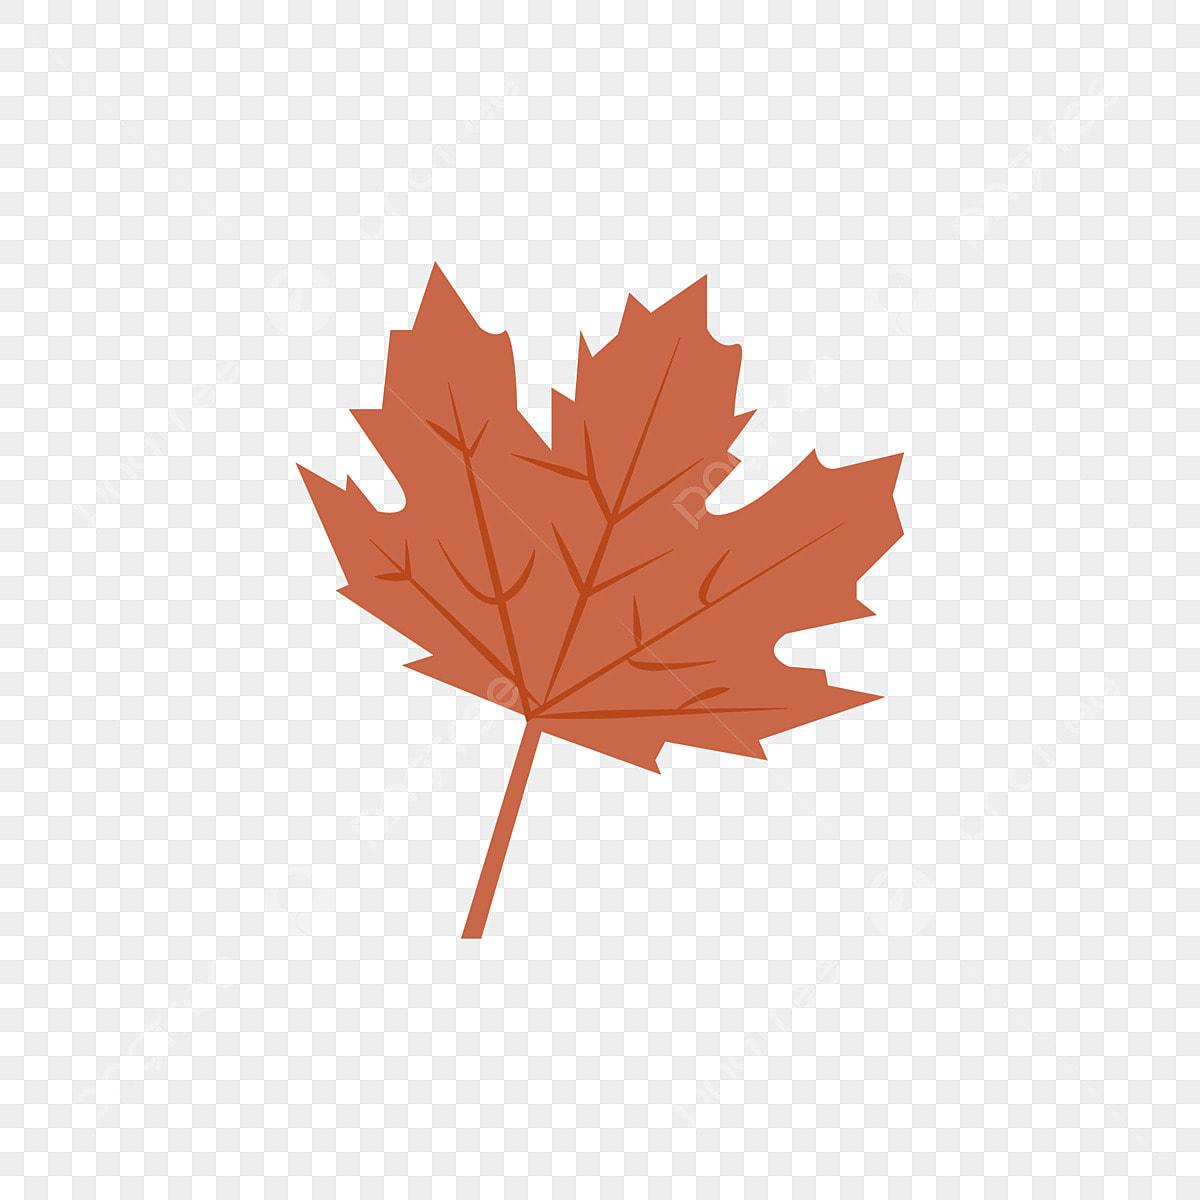 - Autumn Leaf Orange Color Template And Vector, Orange Tree